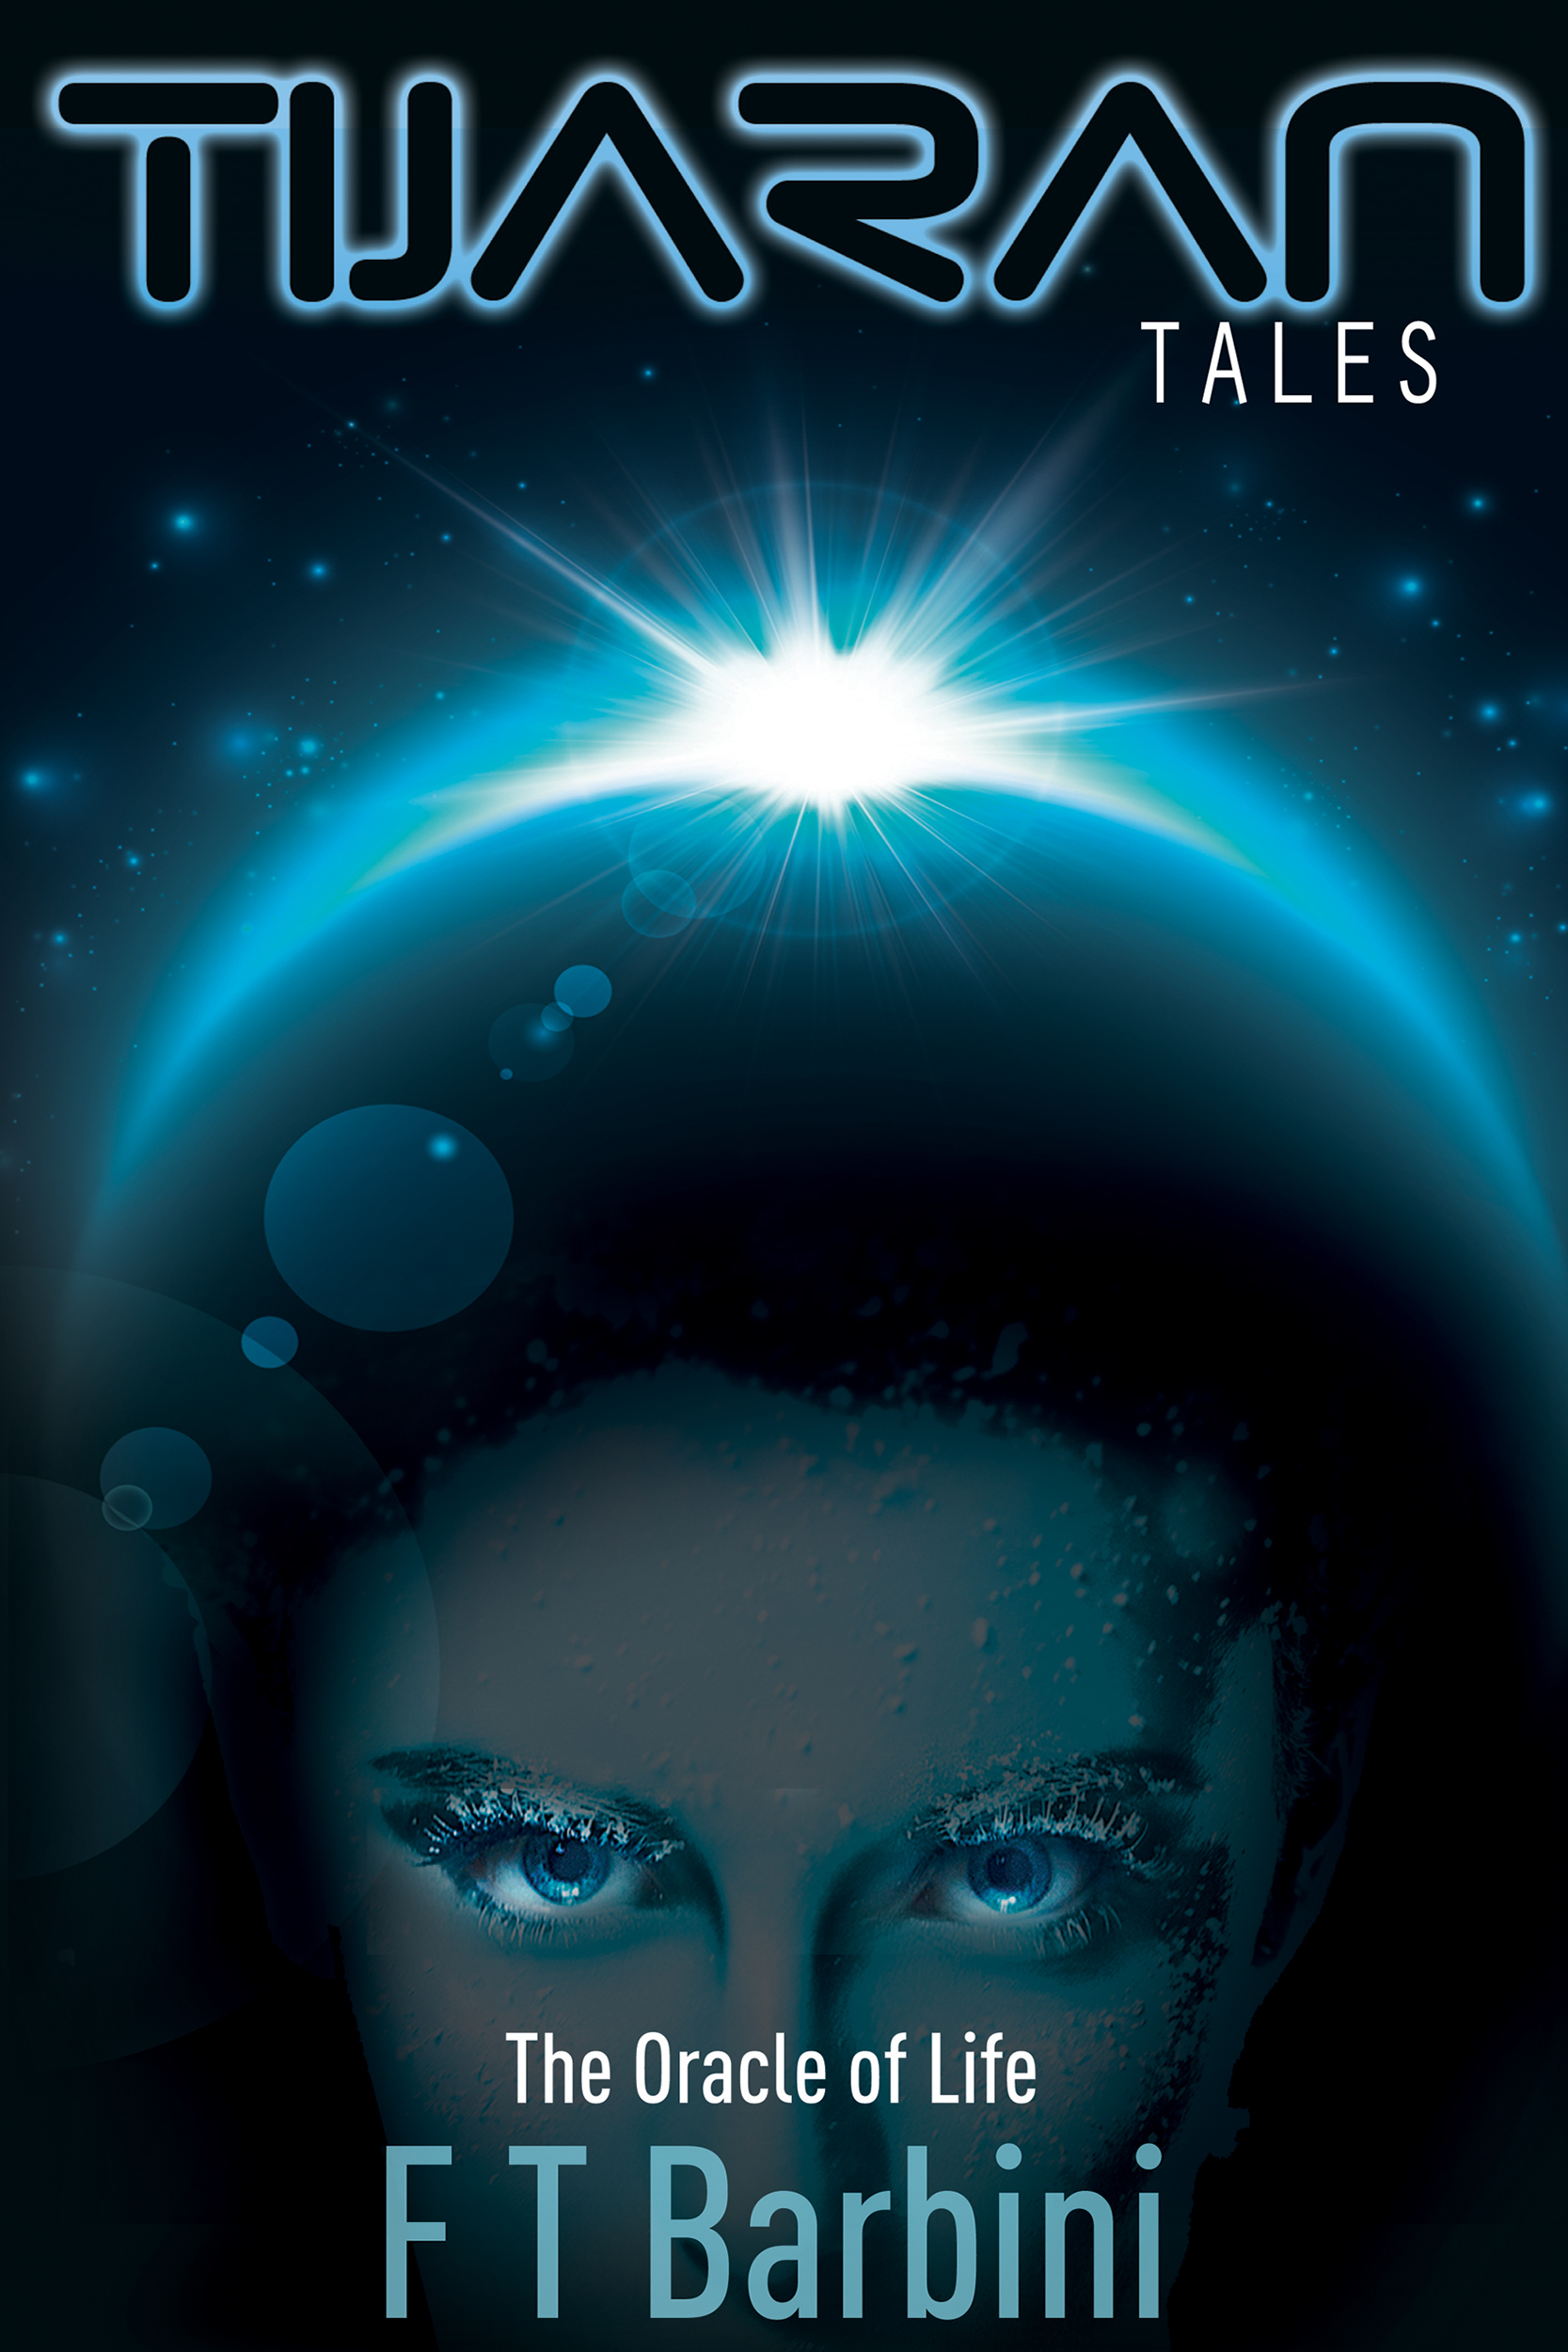 Tijaran Tales: The Oracle of Life (Book 2) FT Barbini